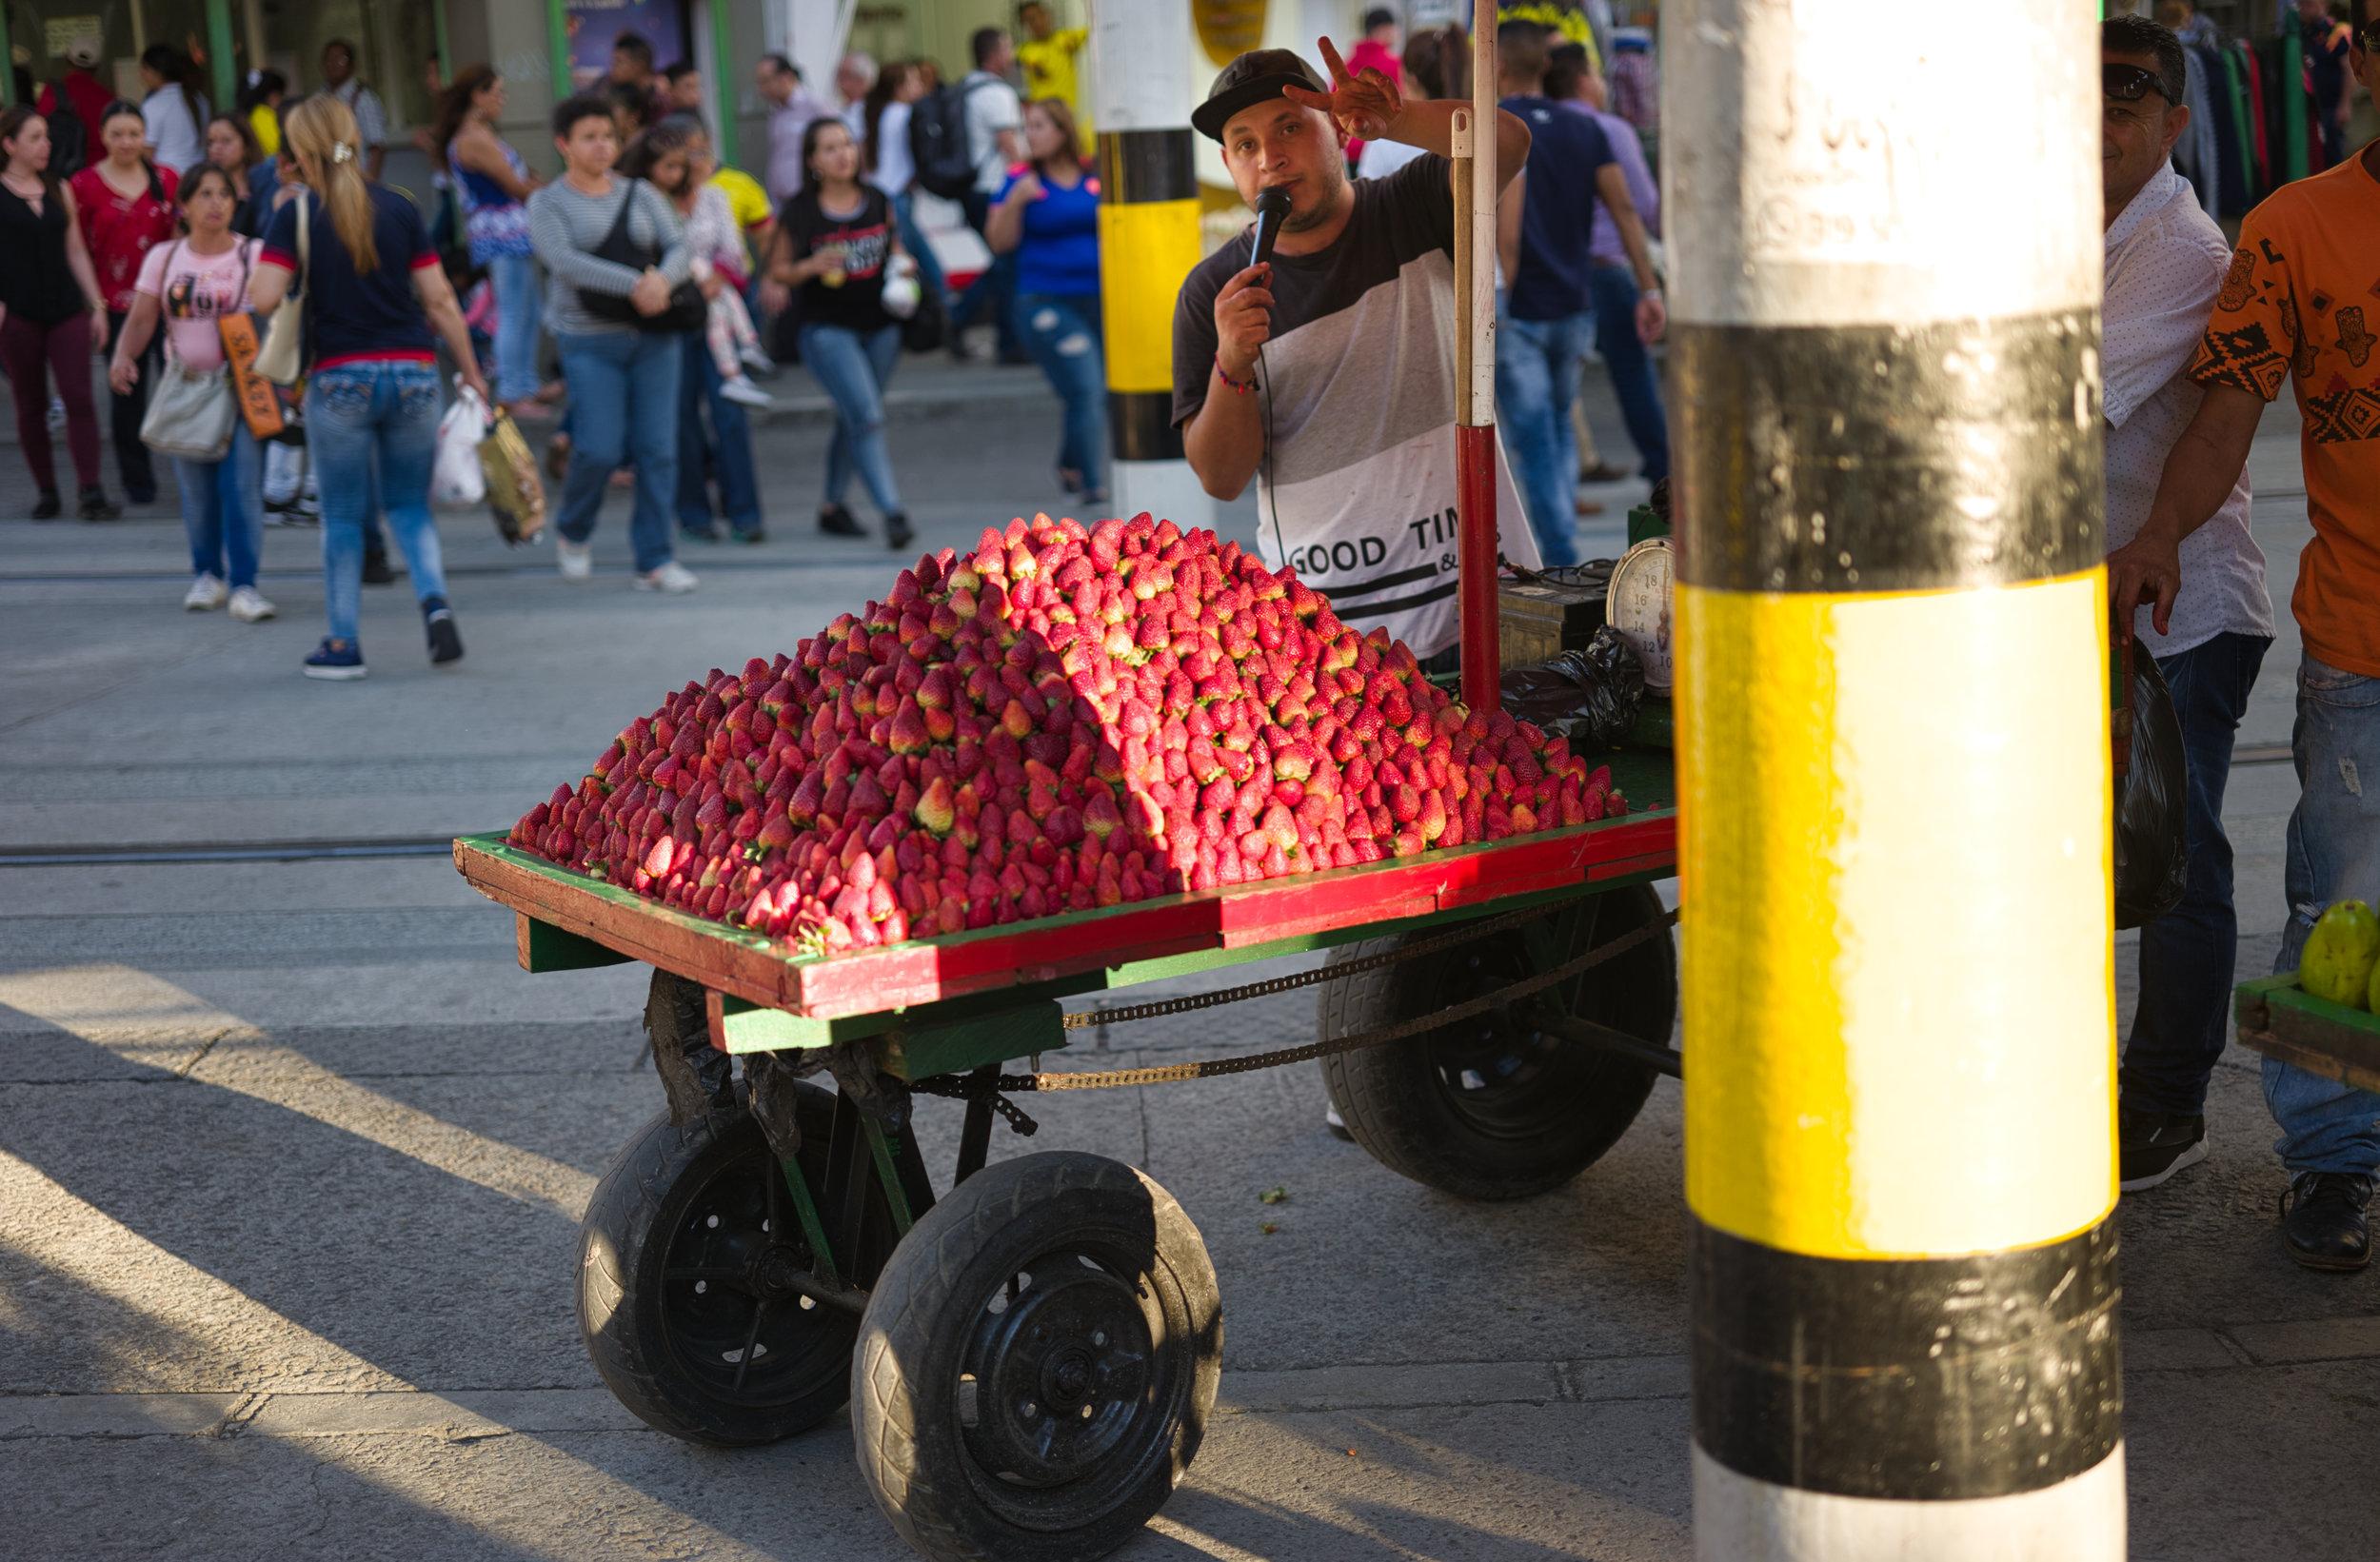 Peace Medellin, Columbia Leica SL 50mm f/2.0 APO Summicron © Keith R. Sbiral, 2018